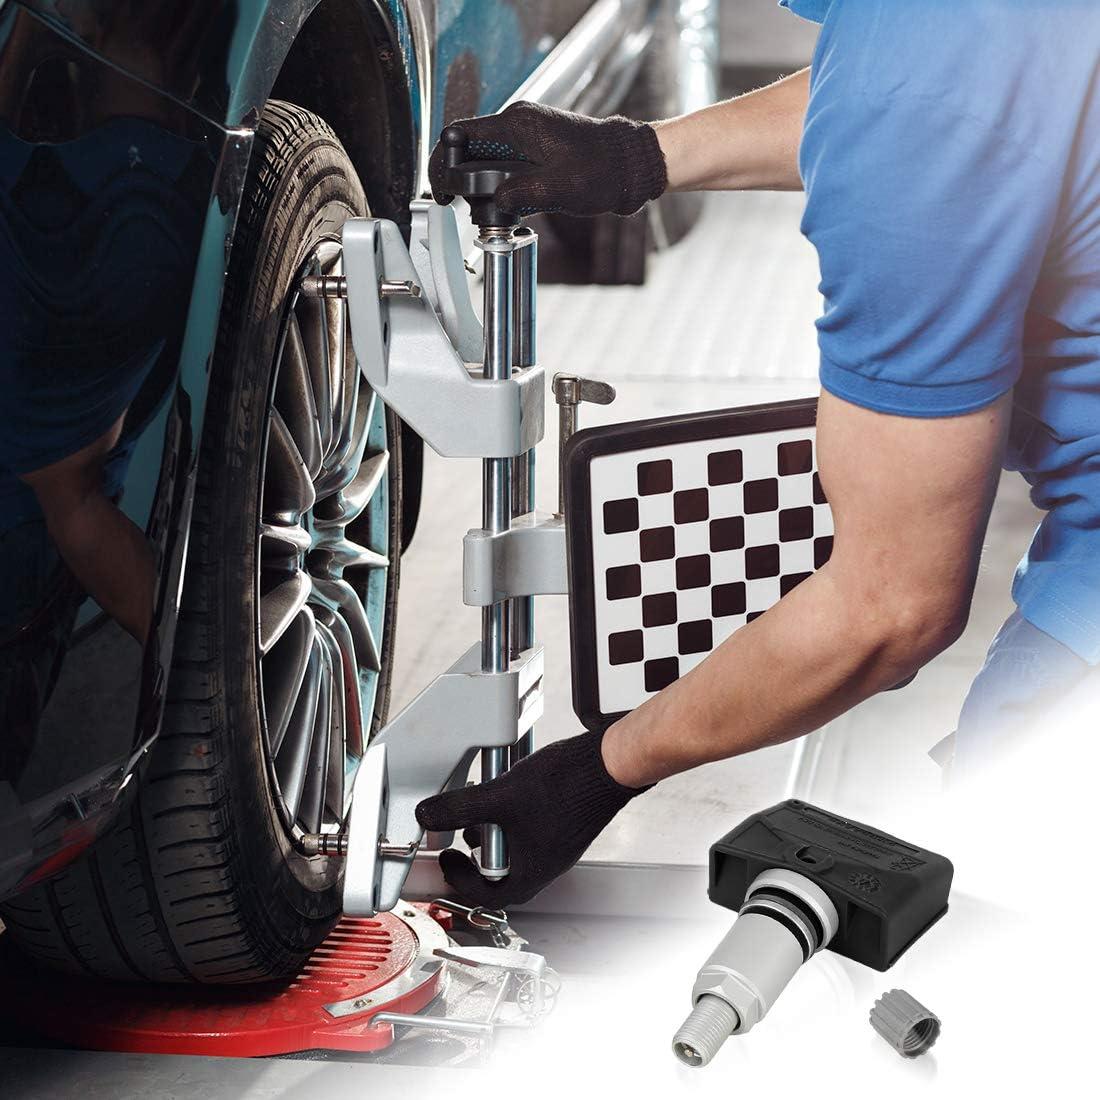 X AUTOHAUX 25773946 Tire Pressure Monitoring System Sensor TPMS Sensor 315MHz for Chevrolet Corvette 2001-2004